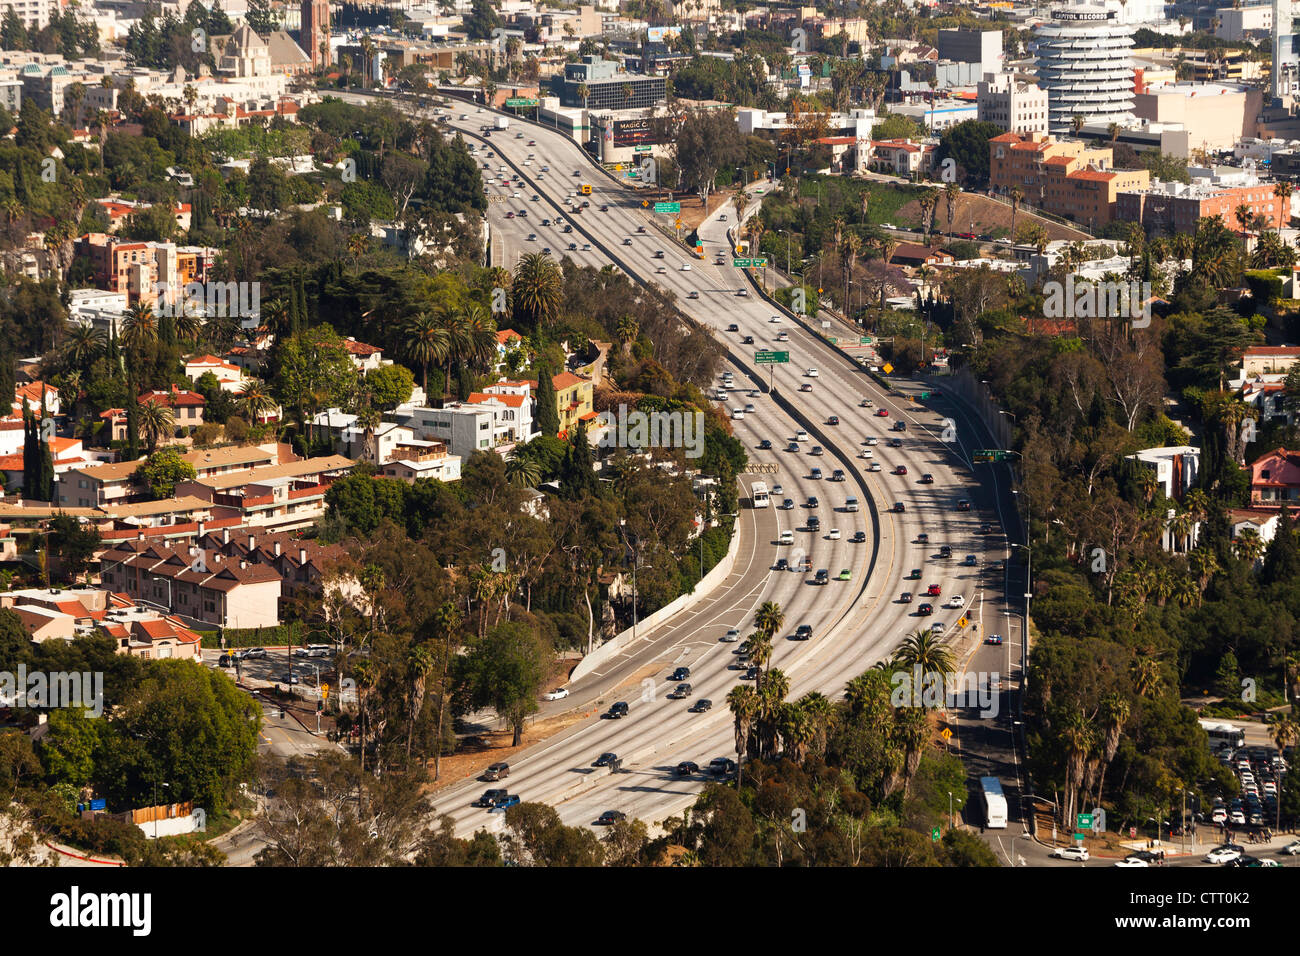 Hollywood Freeway LA - Stock Image